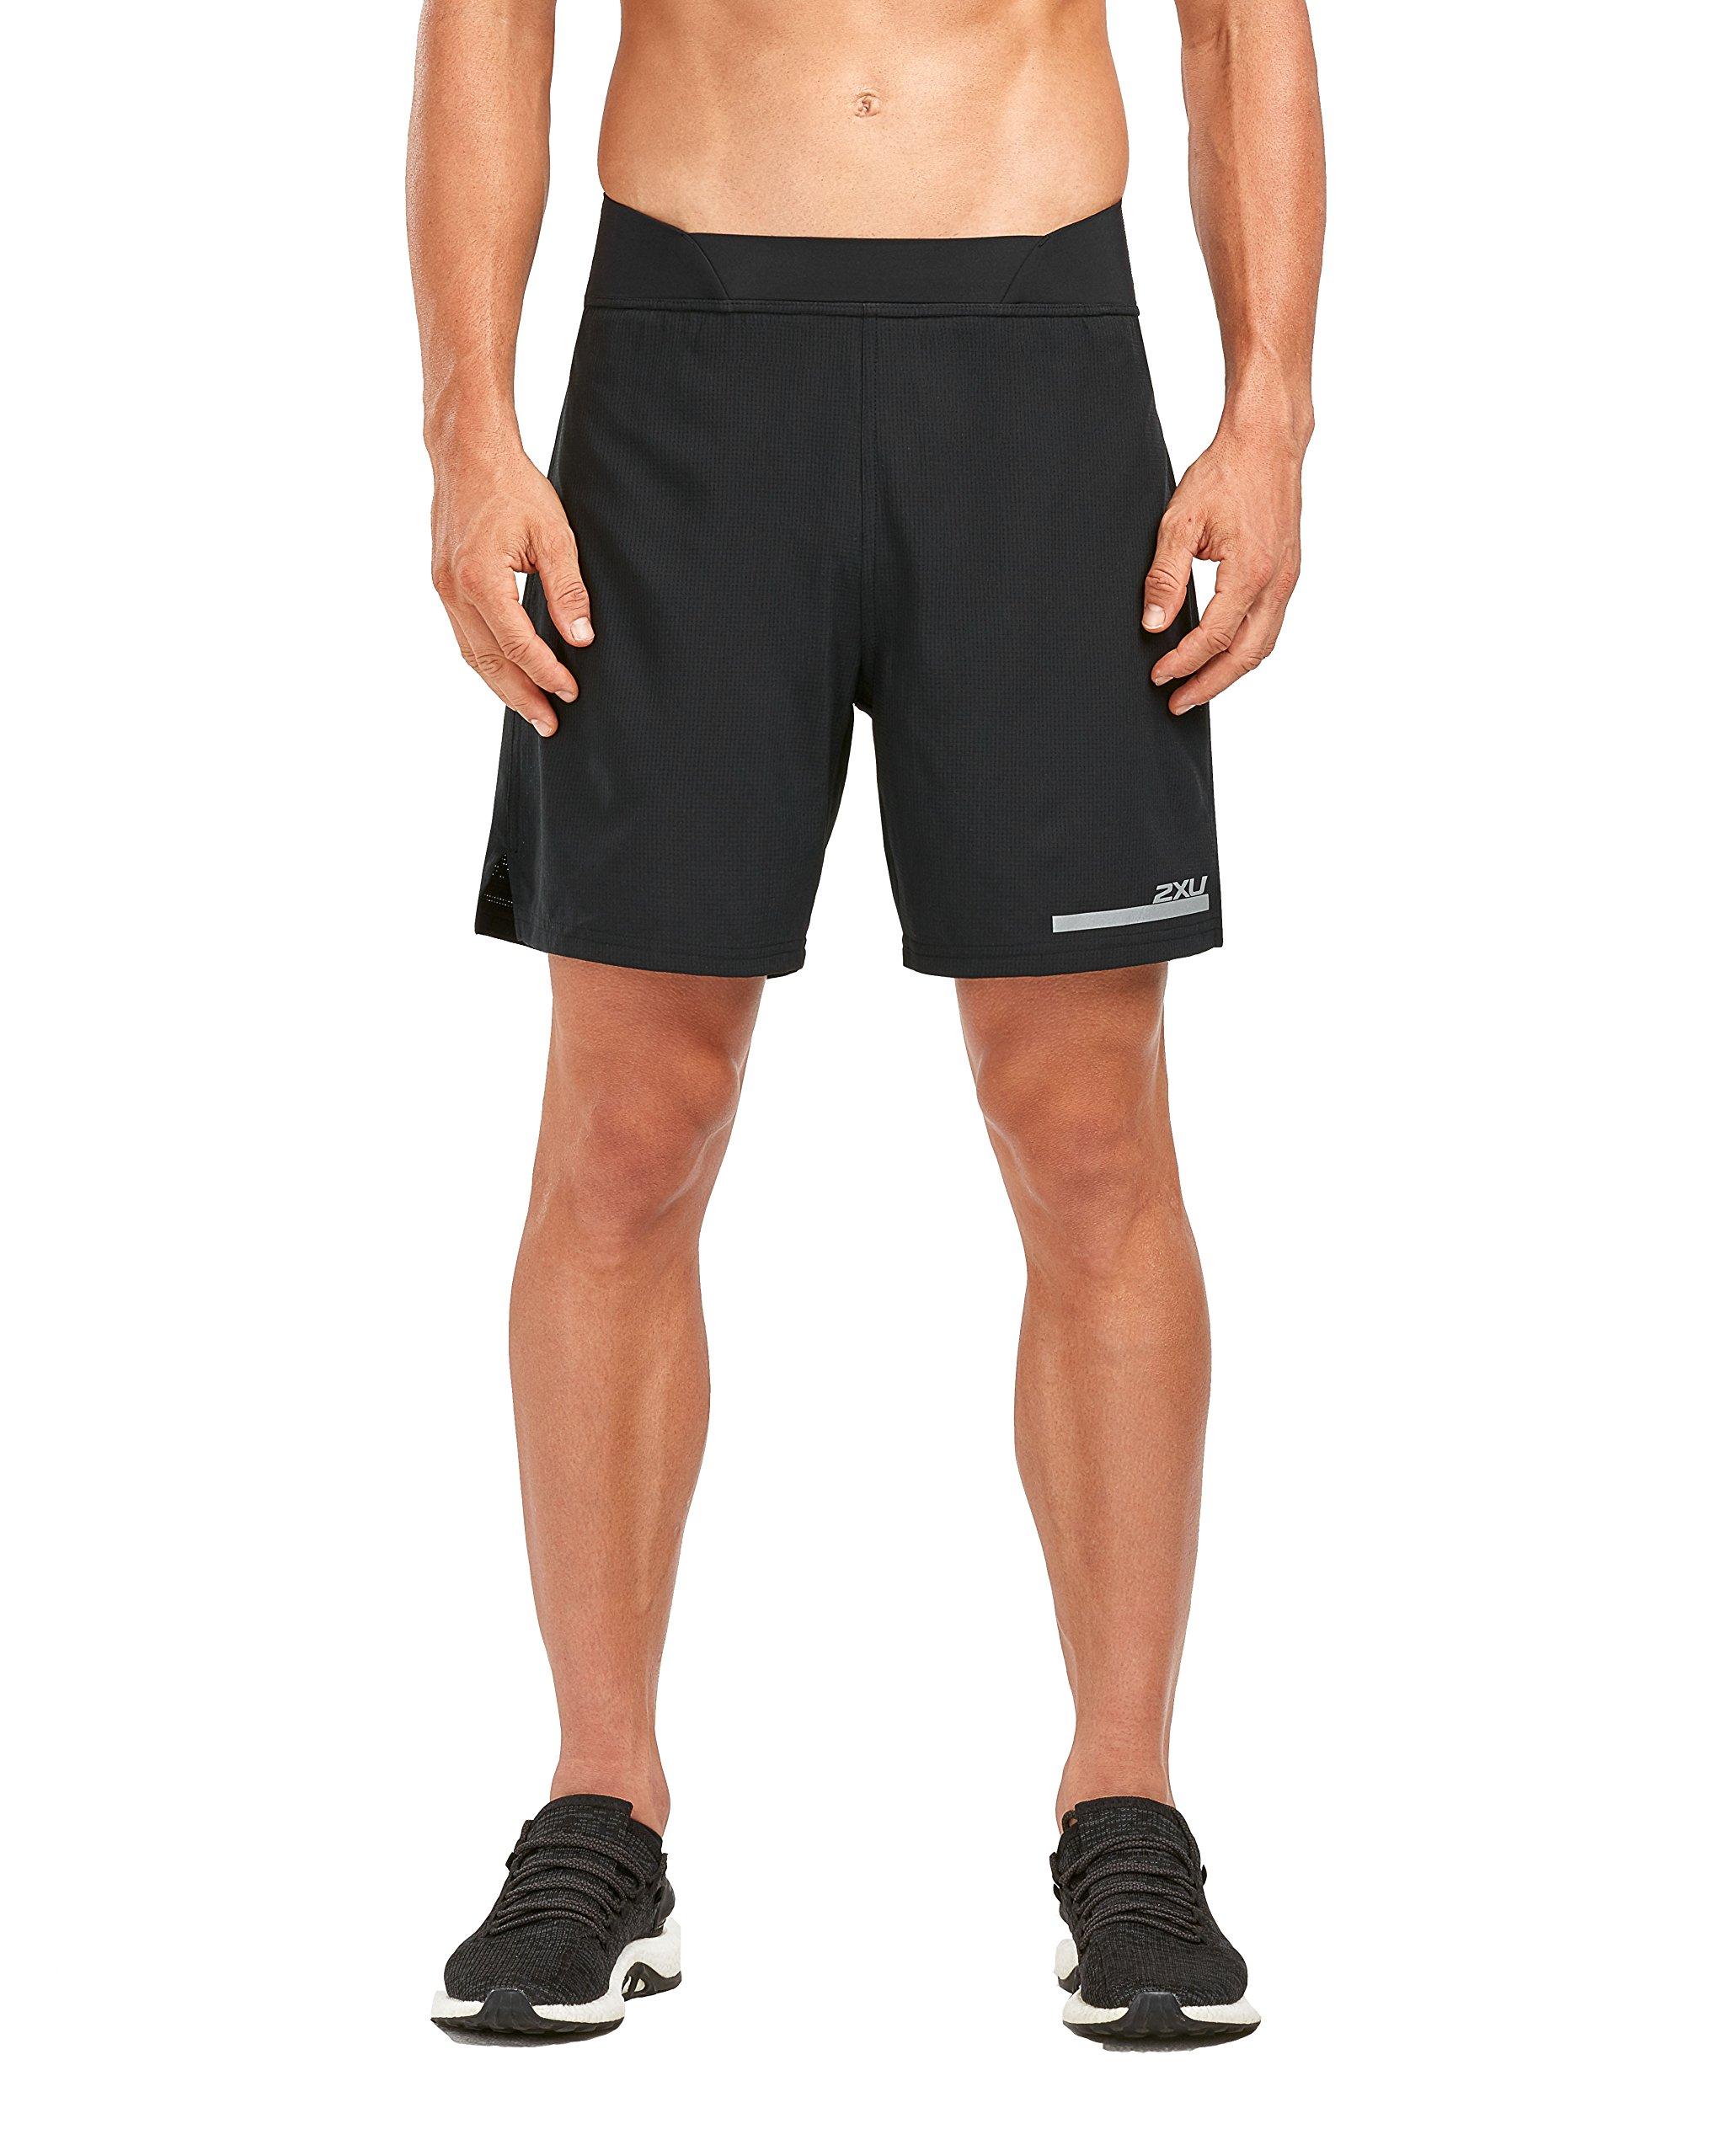 2XU Men's Run 2 in 1 Compression 7 Inch Shorts (Black/Silver, Extra Small)